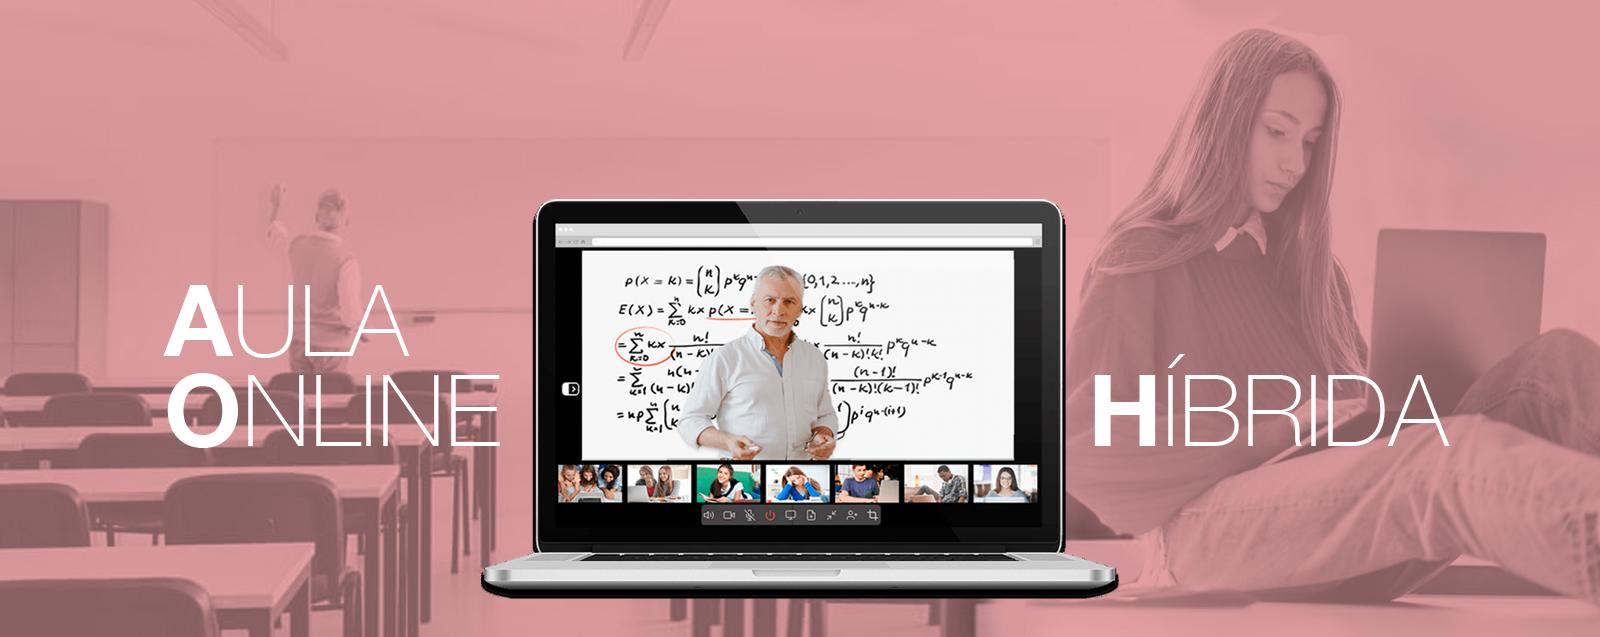 Aula online hibrida OmDigital Soluciones Audiovisuales